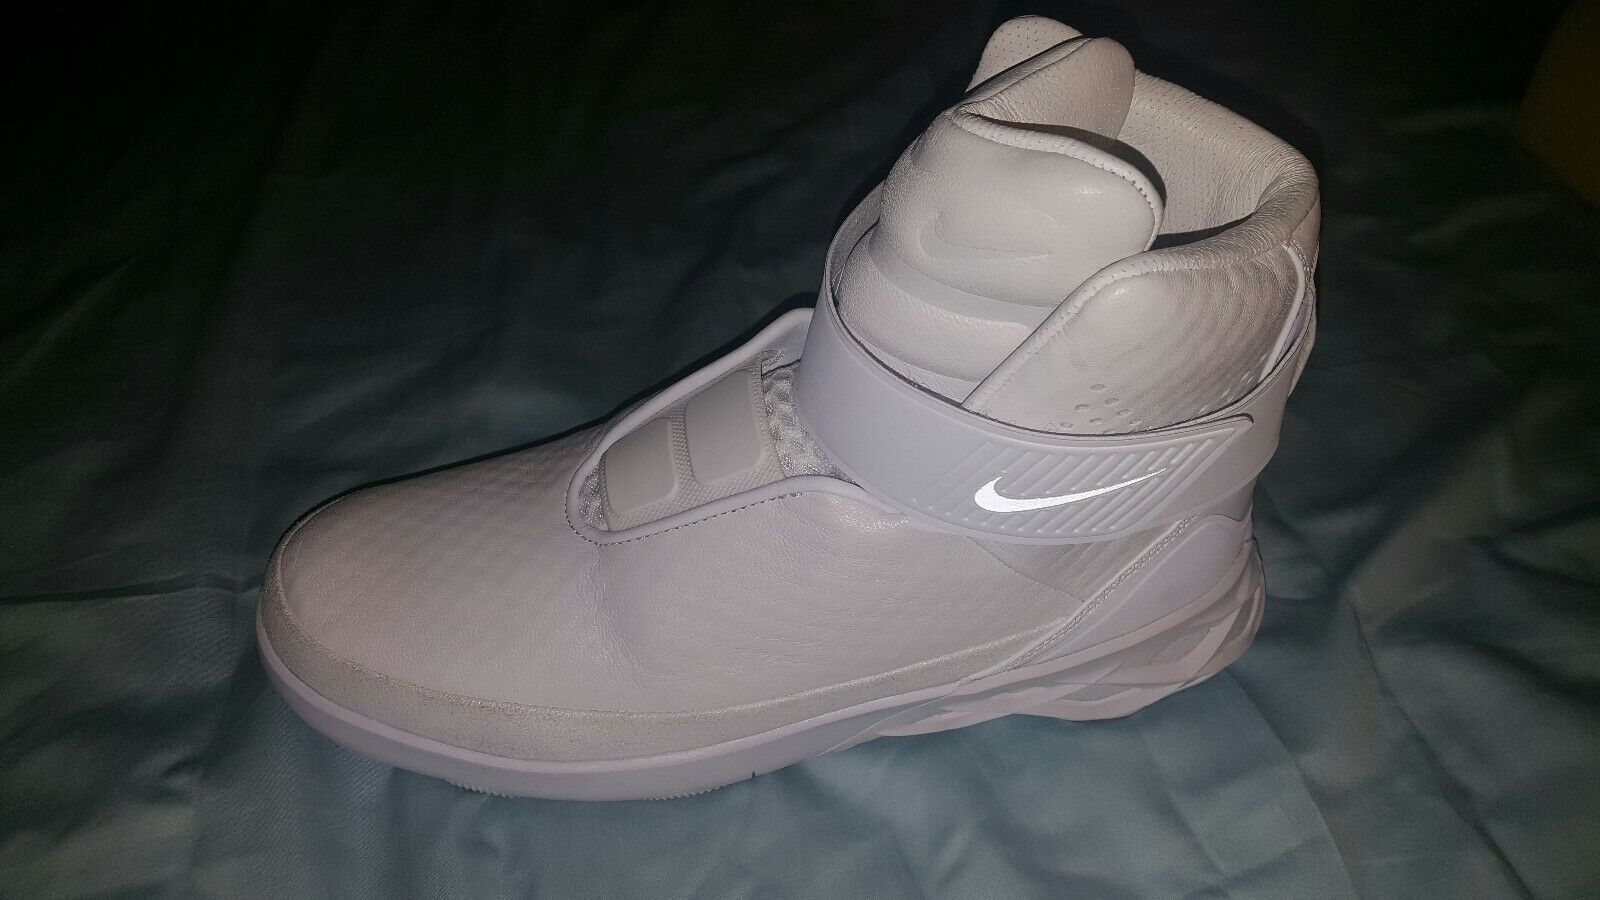 Nike air force 1 ultraforce ciao Uomo casual scorpe: 003 10 buio di stucco 880854 003 scorpe: a35d2d